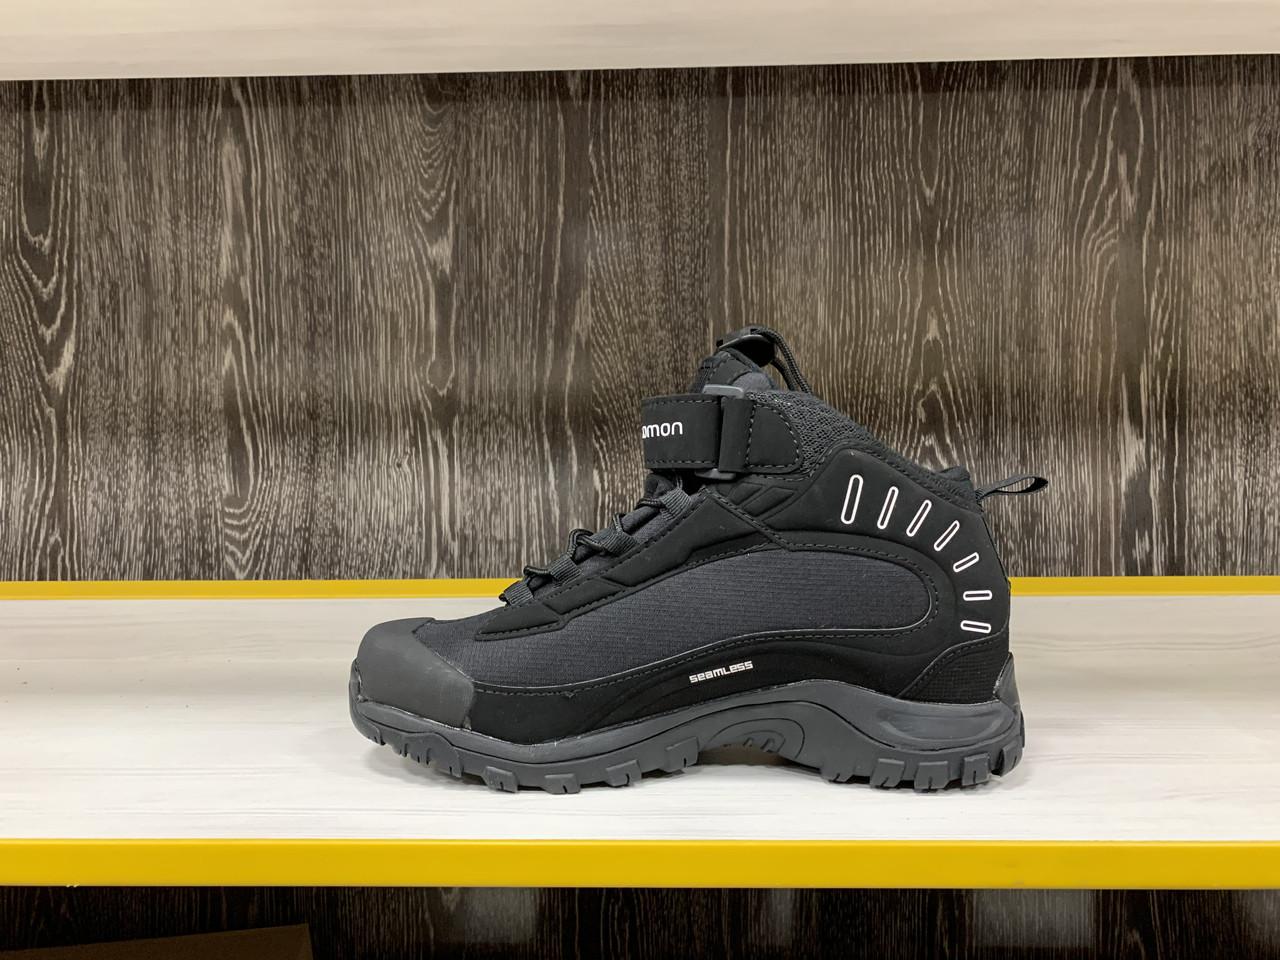 Ботинки Зимние Salomon SHELTER CS WP (Gore-Tex) - фото 2